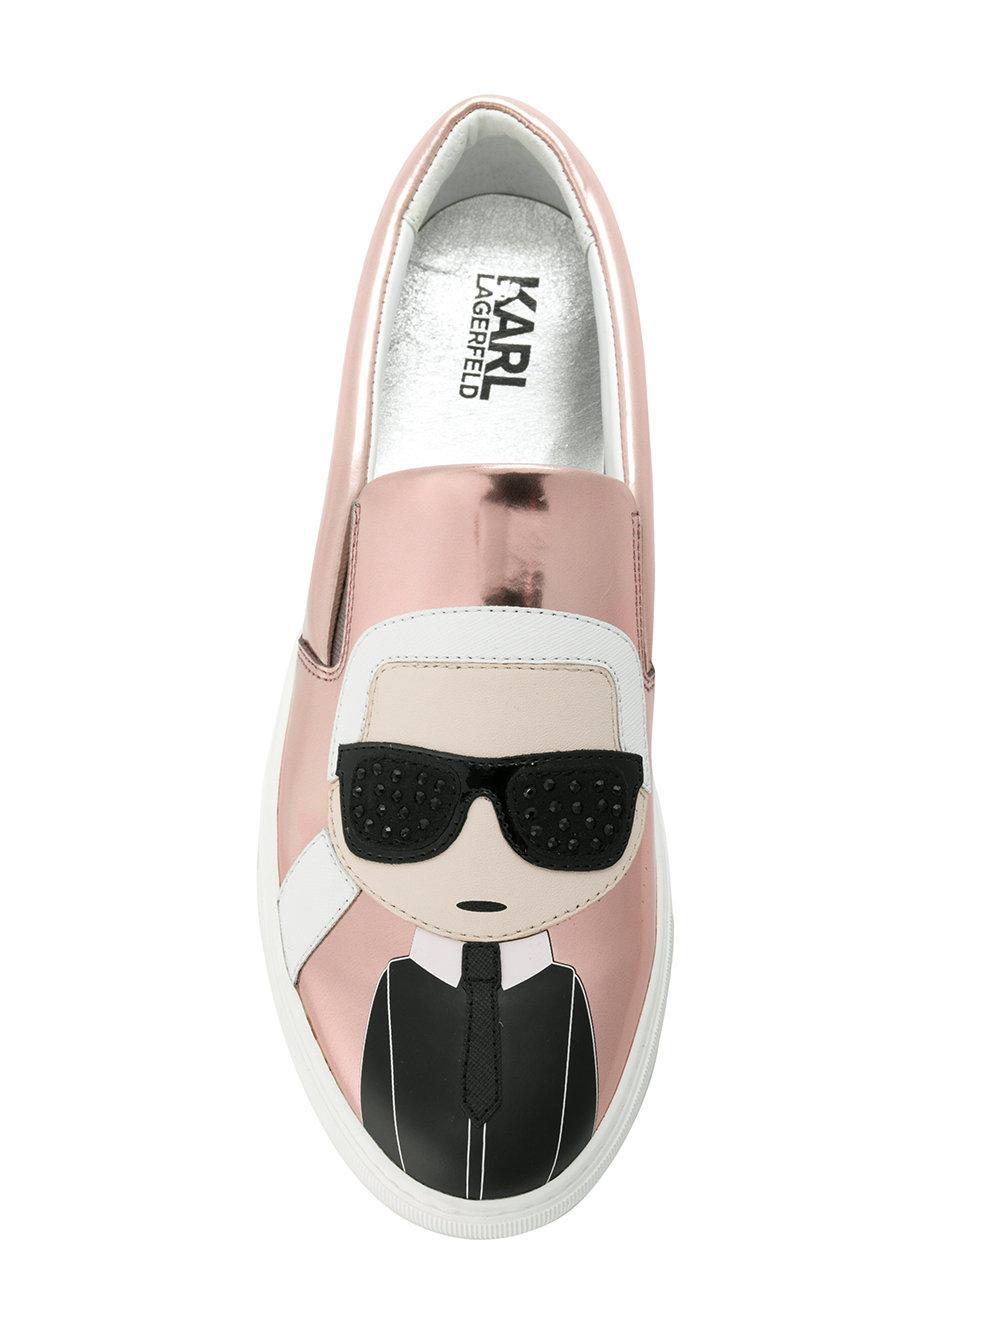 Karl Lagerfeld Rubber Kupsole Karl Ikonic Sneakers in Metallic